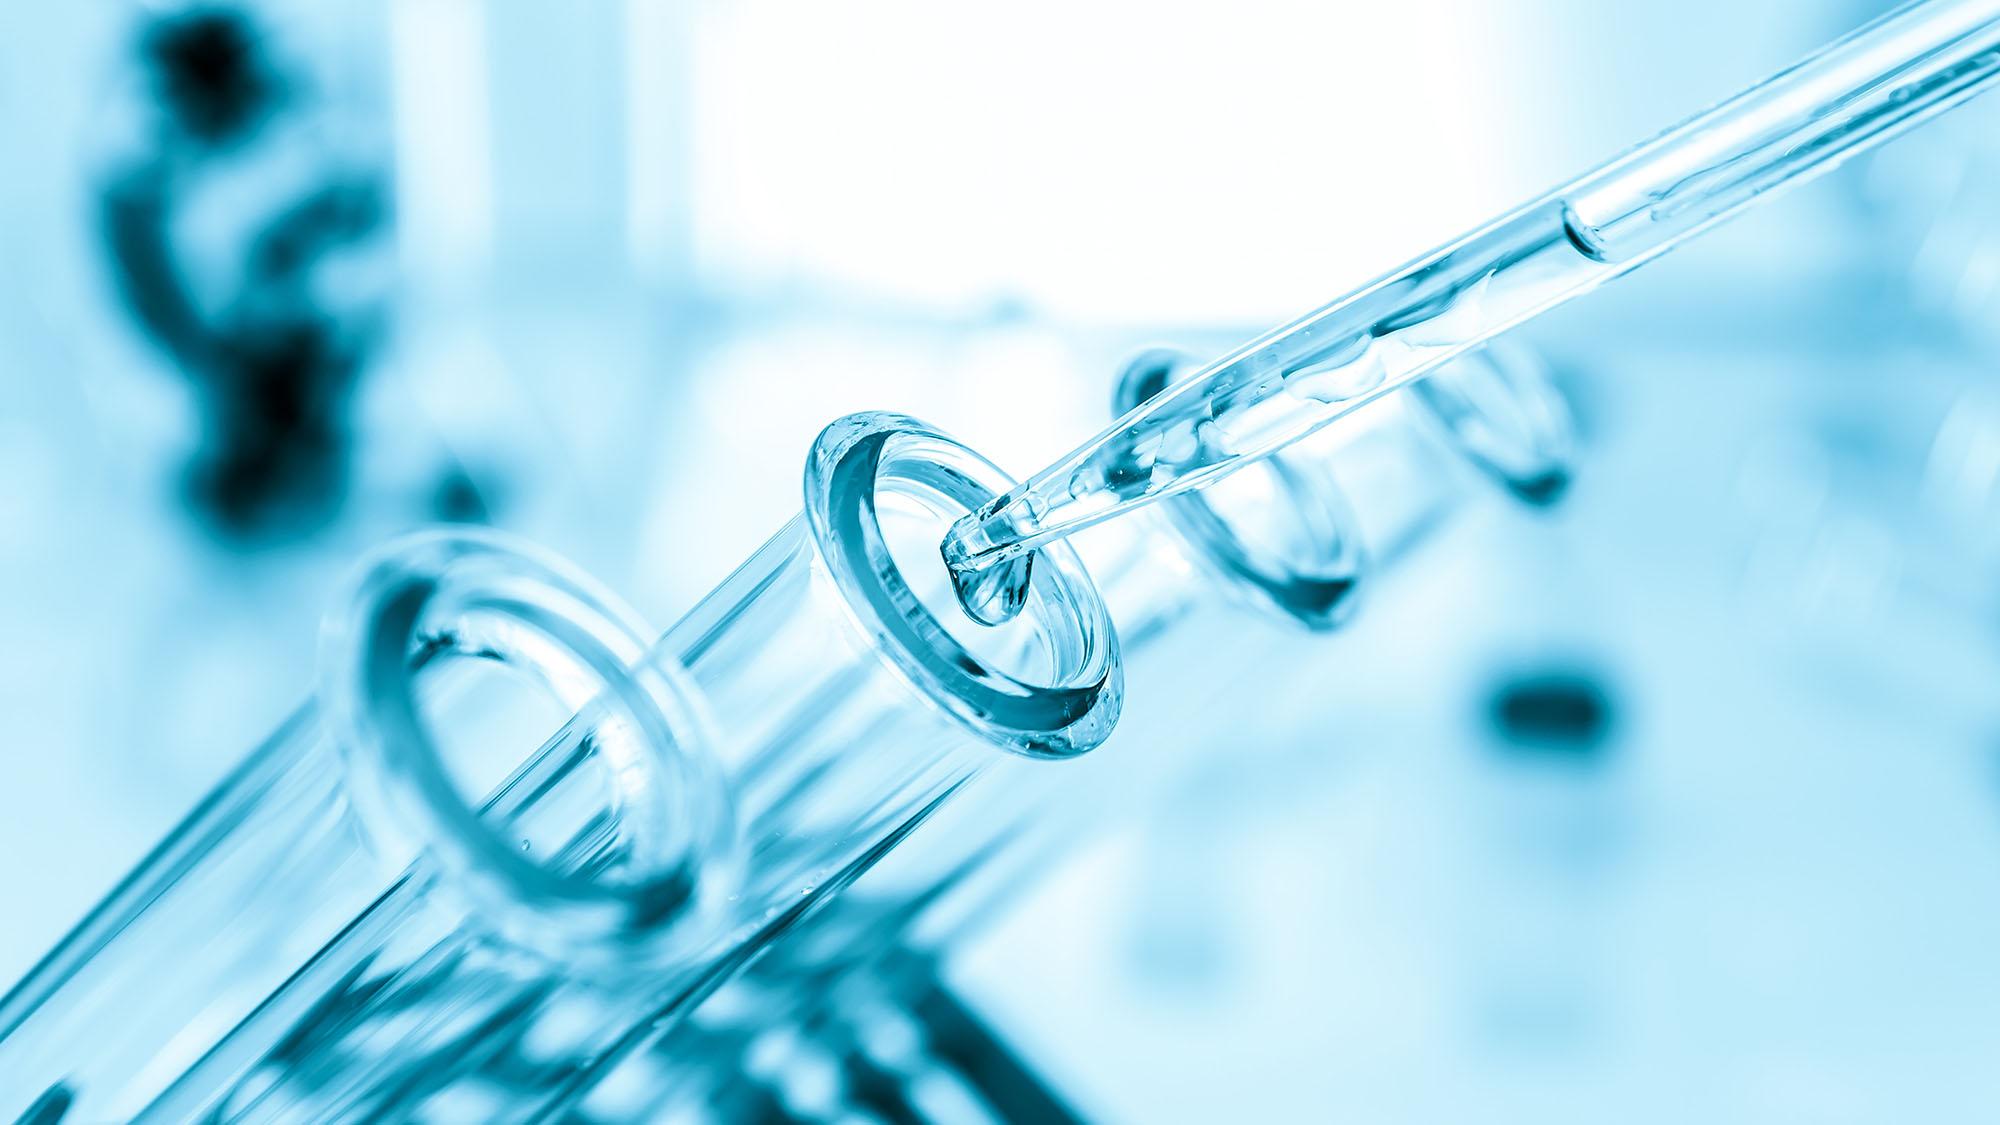 Lab test tube